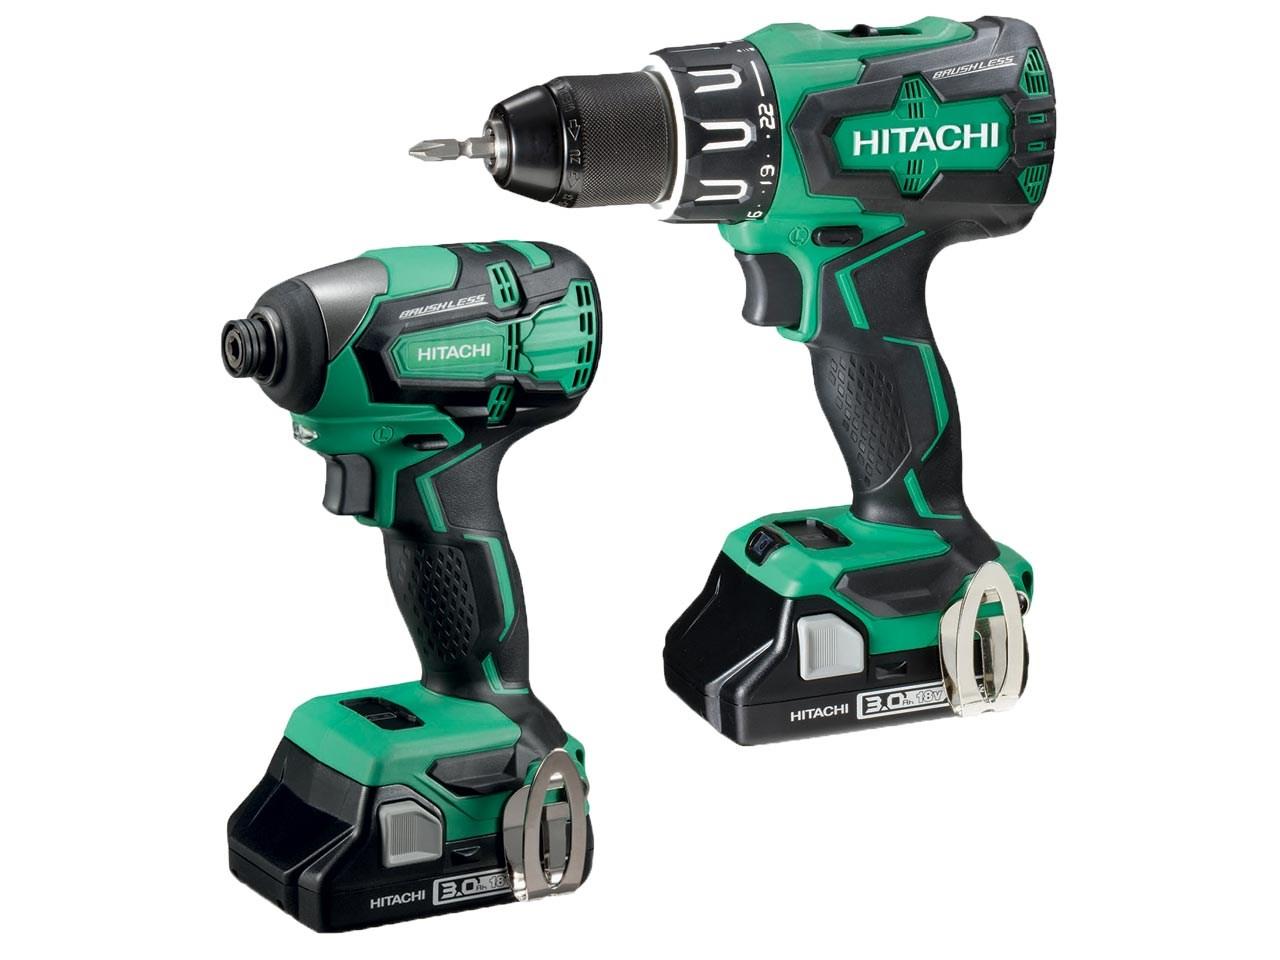 Hitachi drill / driver twin pack - £185 @ FFX